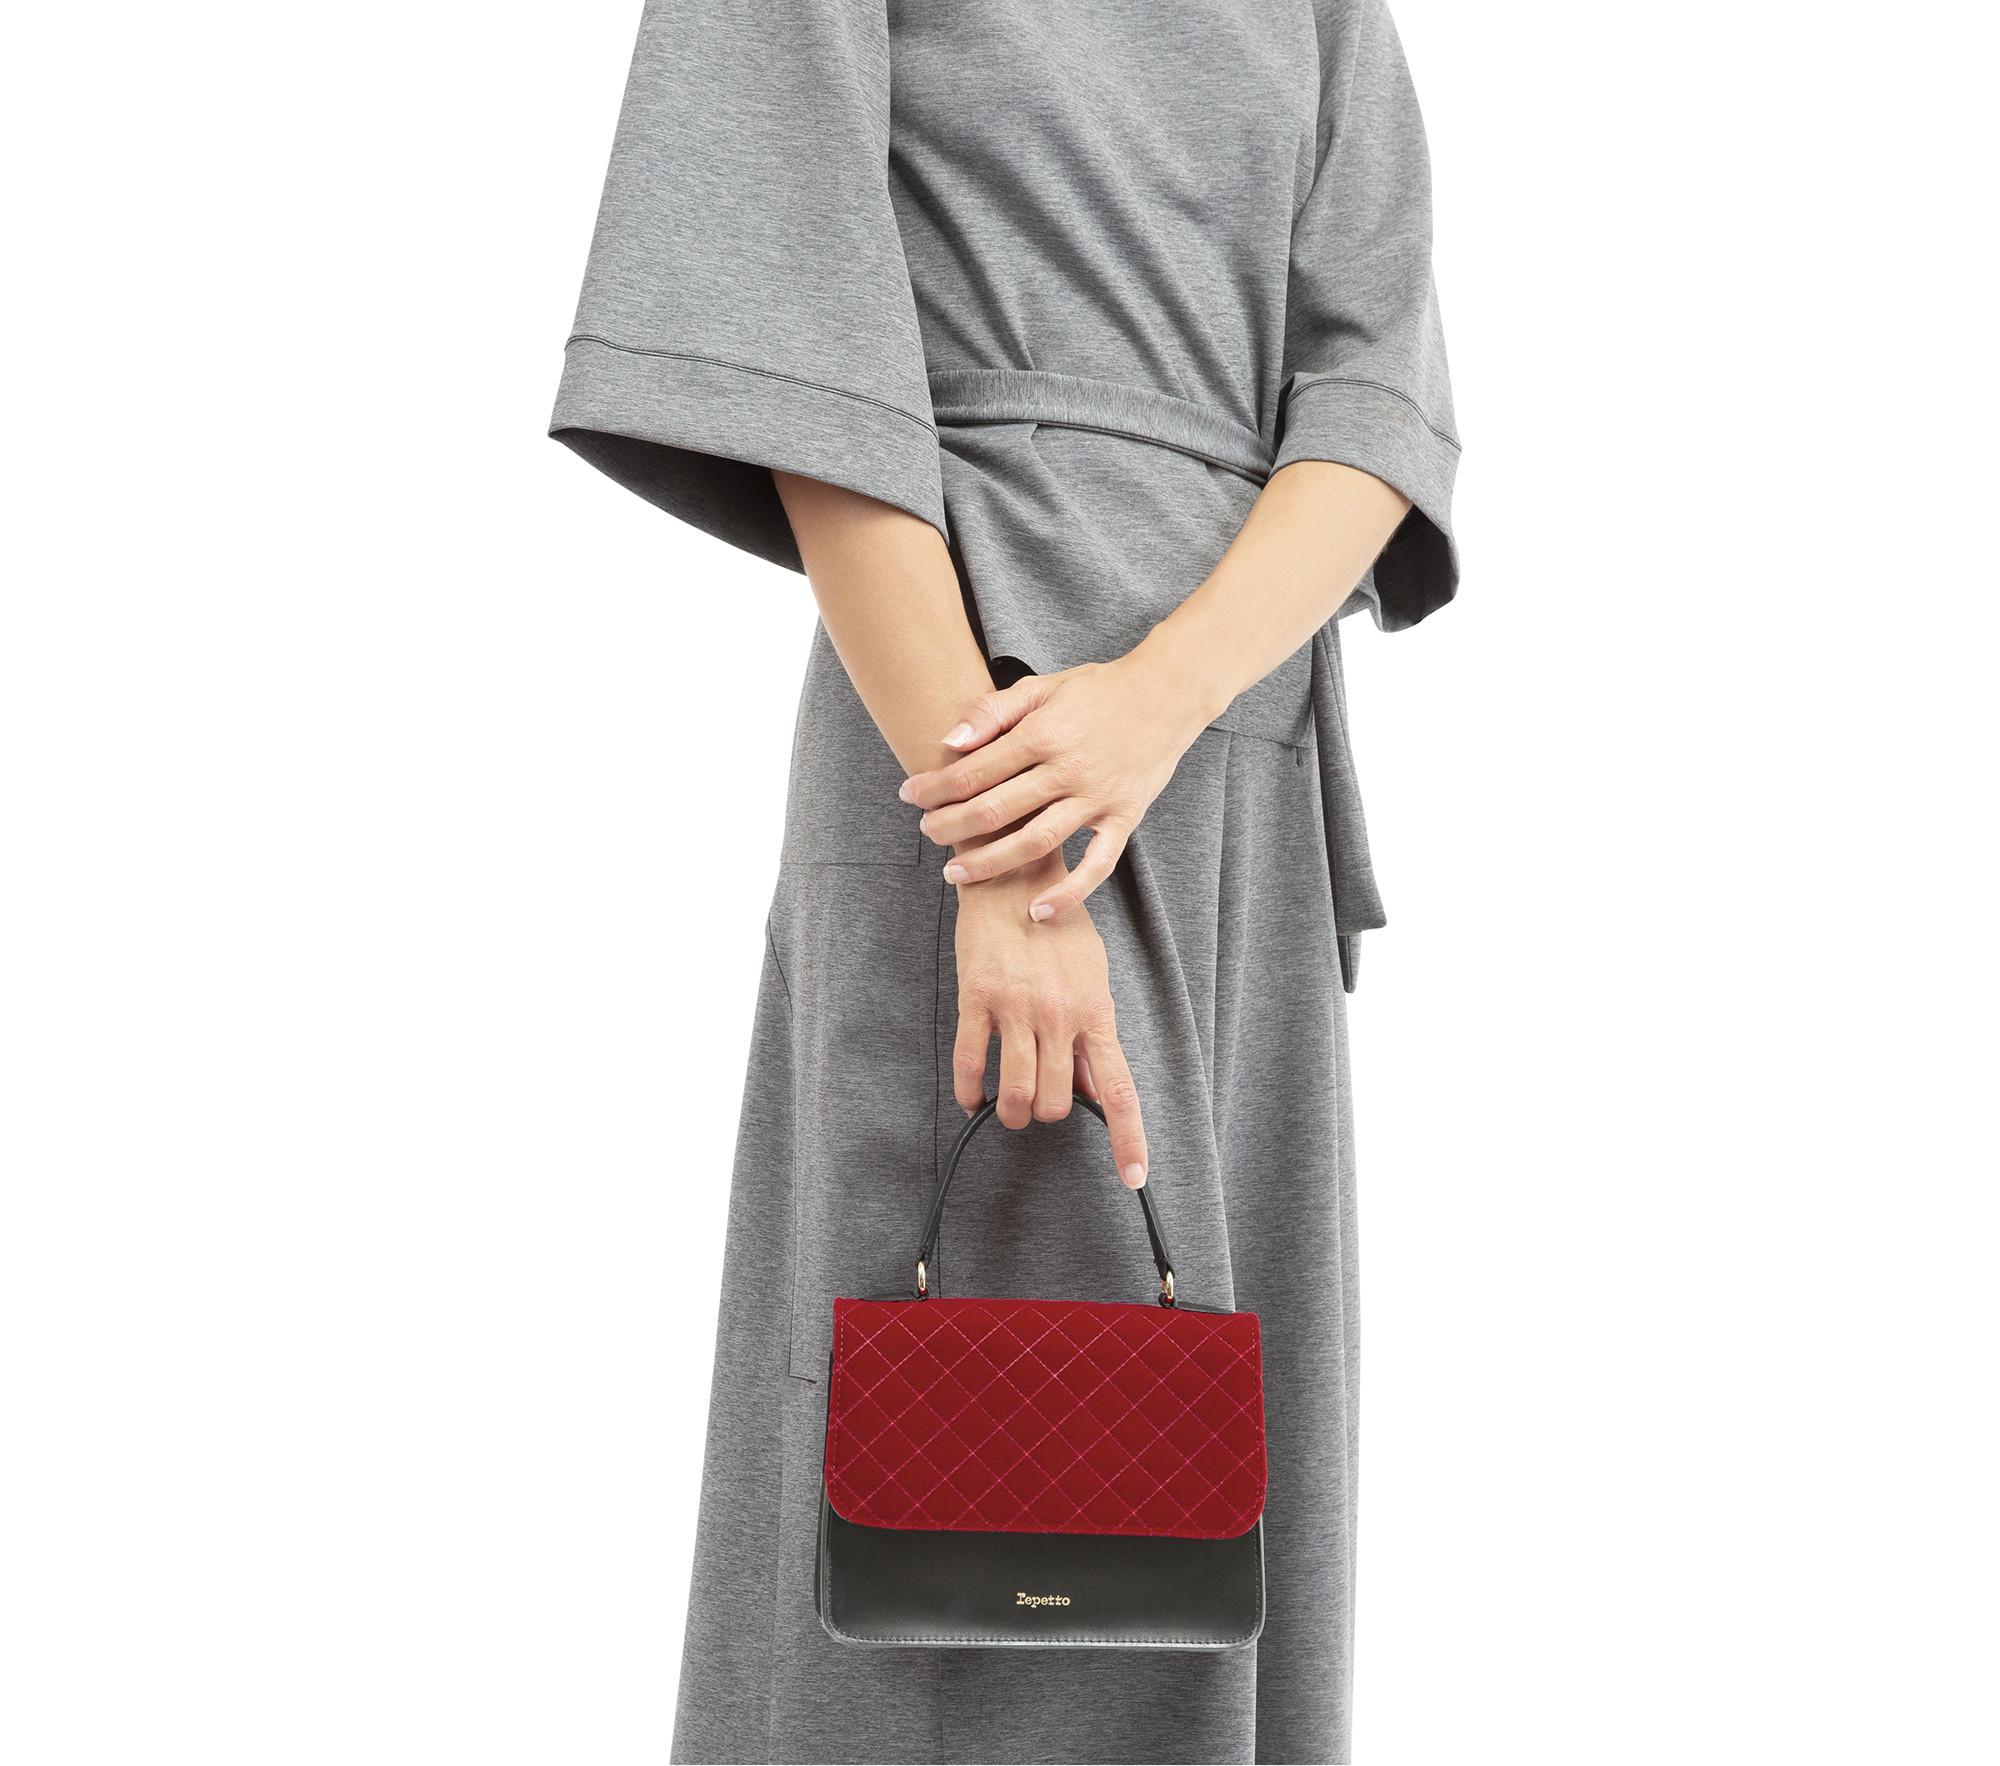 Double Jeu Tasche Kleines Modell